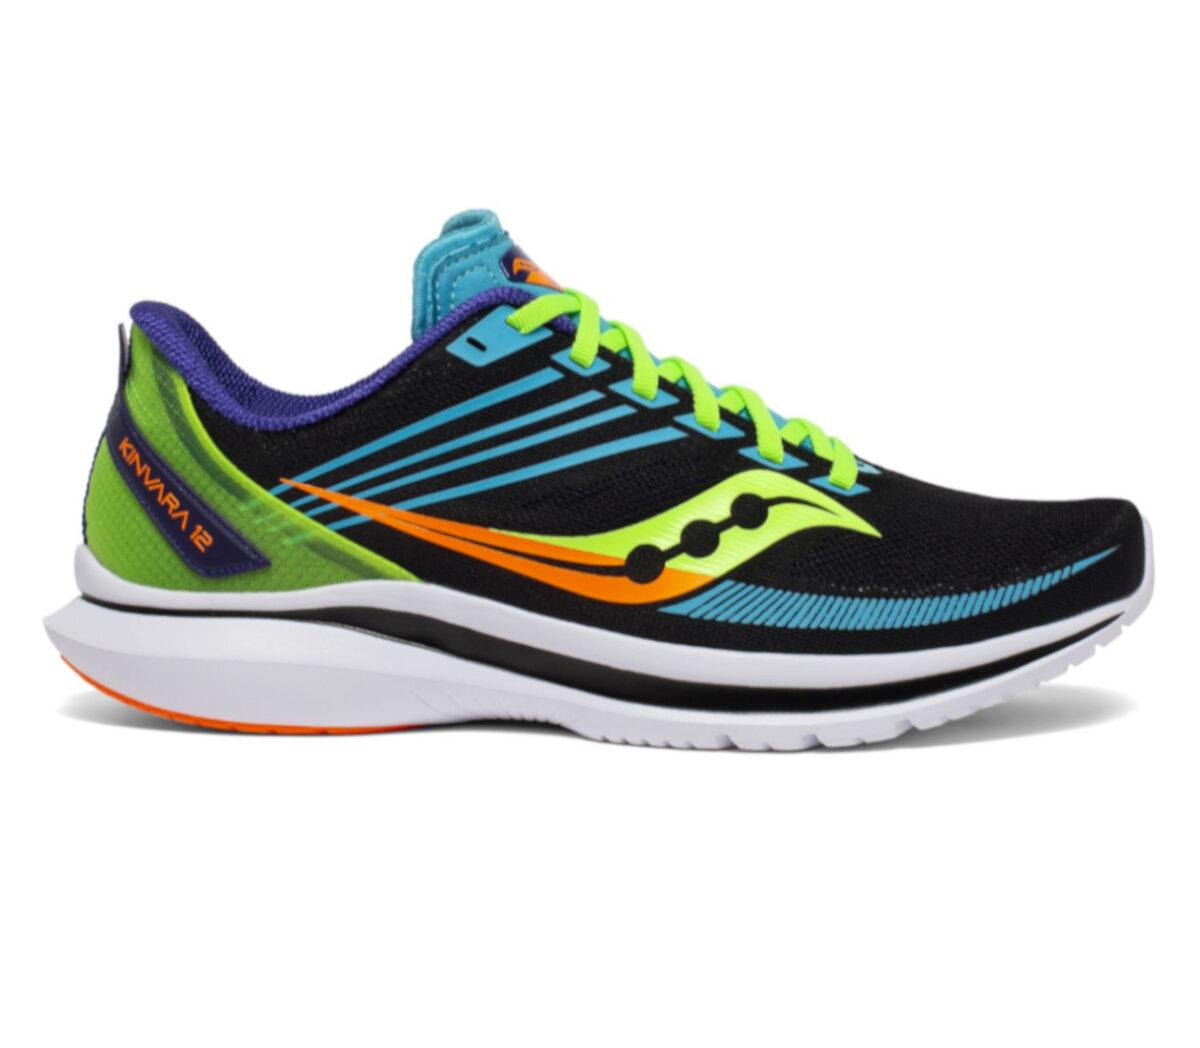 scarpa running veloce uomo saucony kinvara 12 nera, gialla, verde, arancione